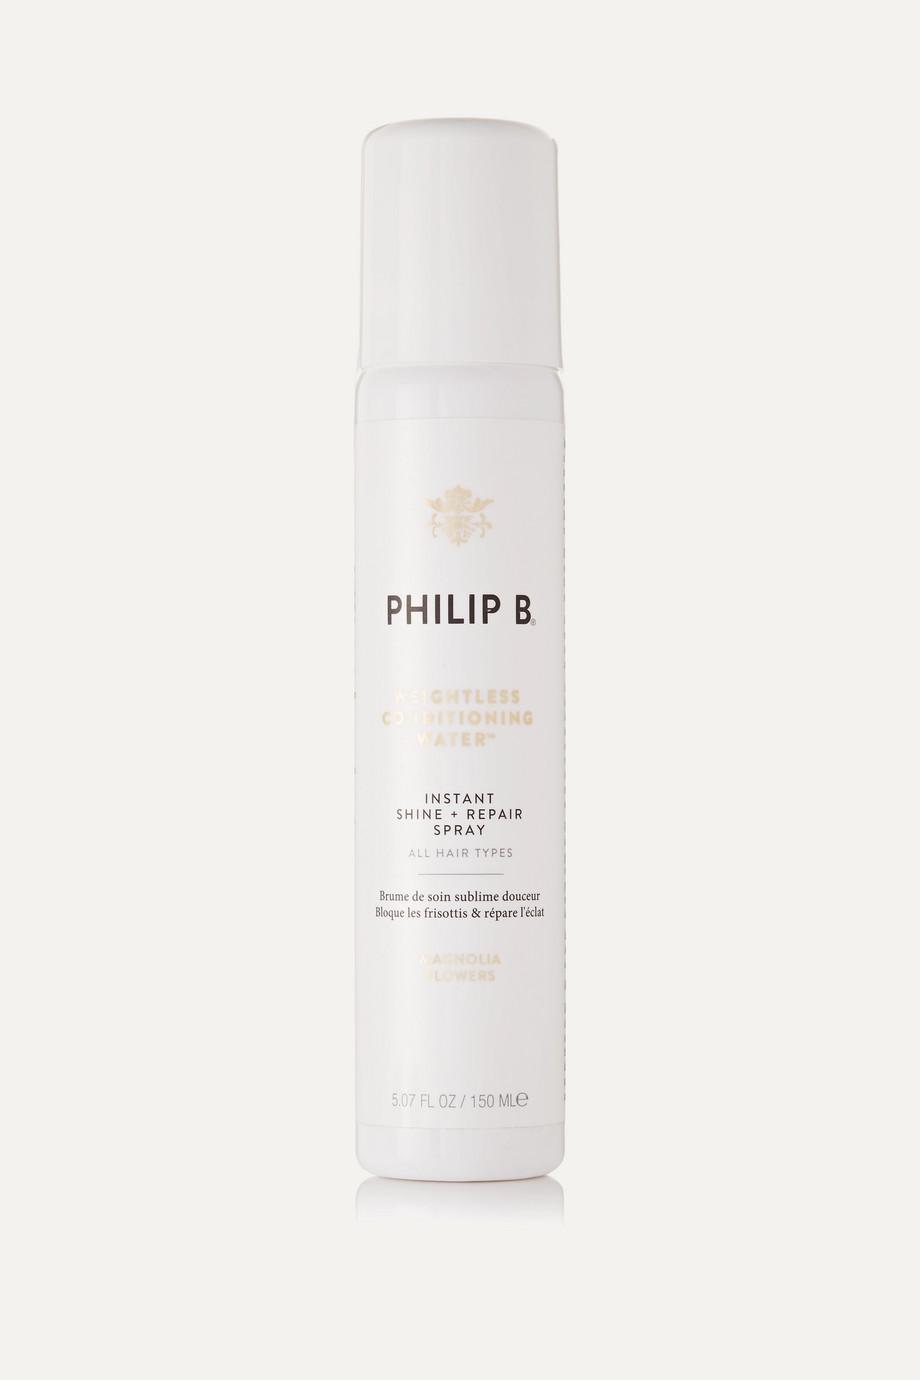 Philip B Weightless Conditioning Water, 150ml